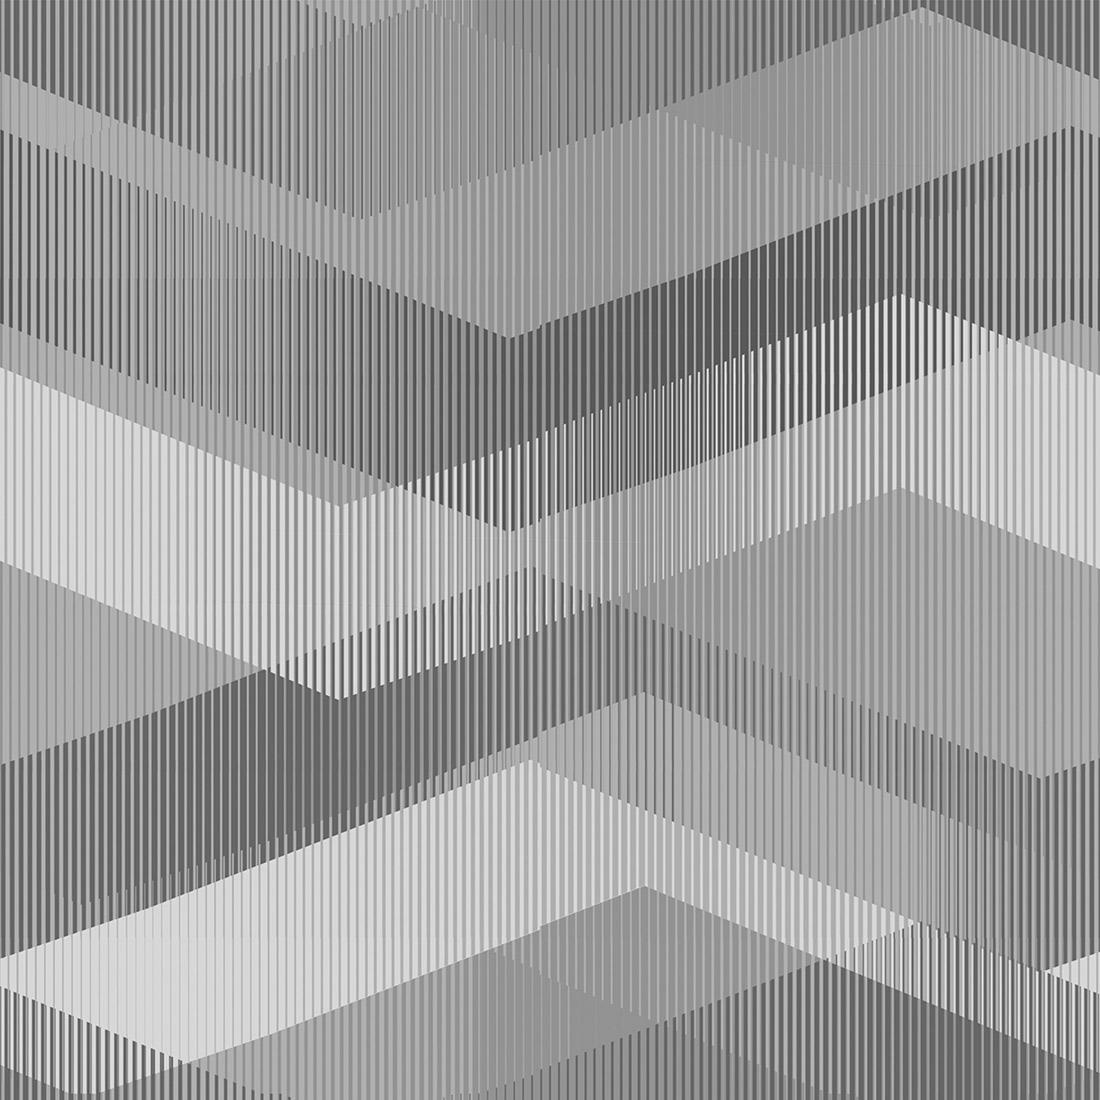 Papel de Parede Geométrico Textura Cinza